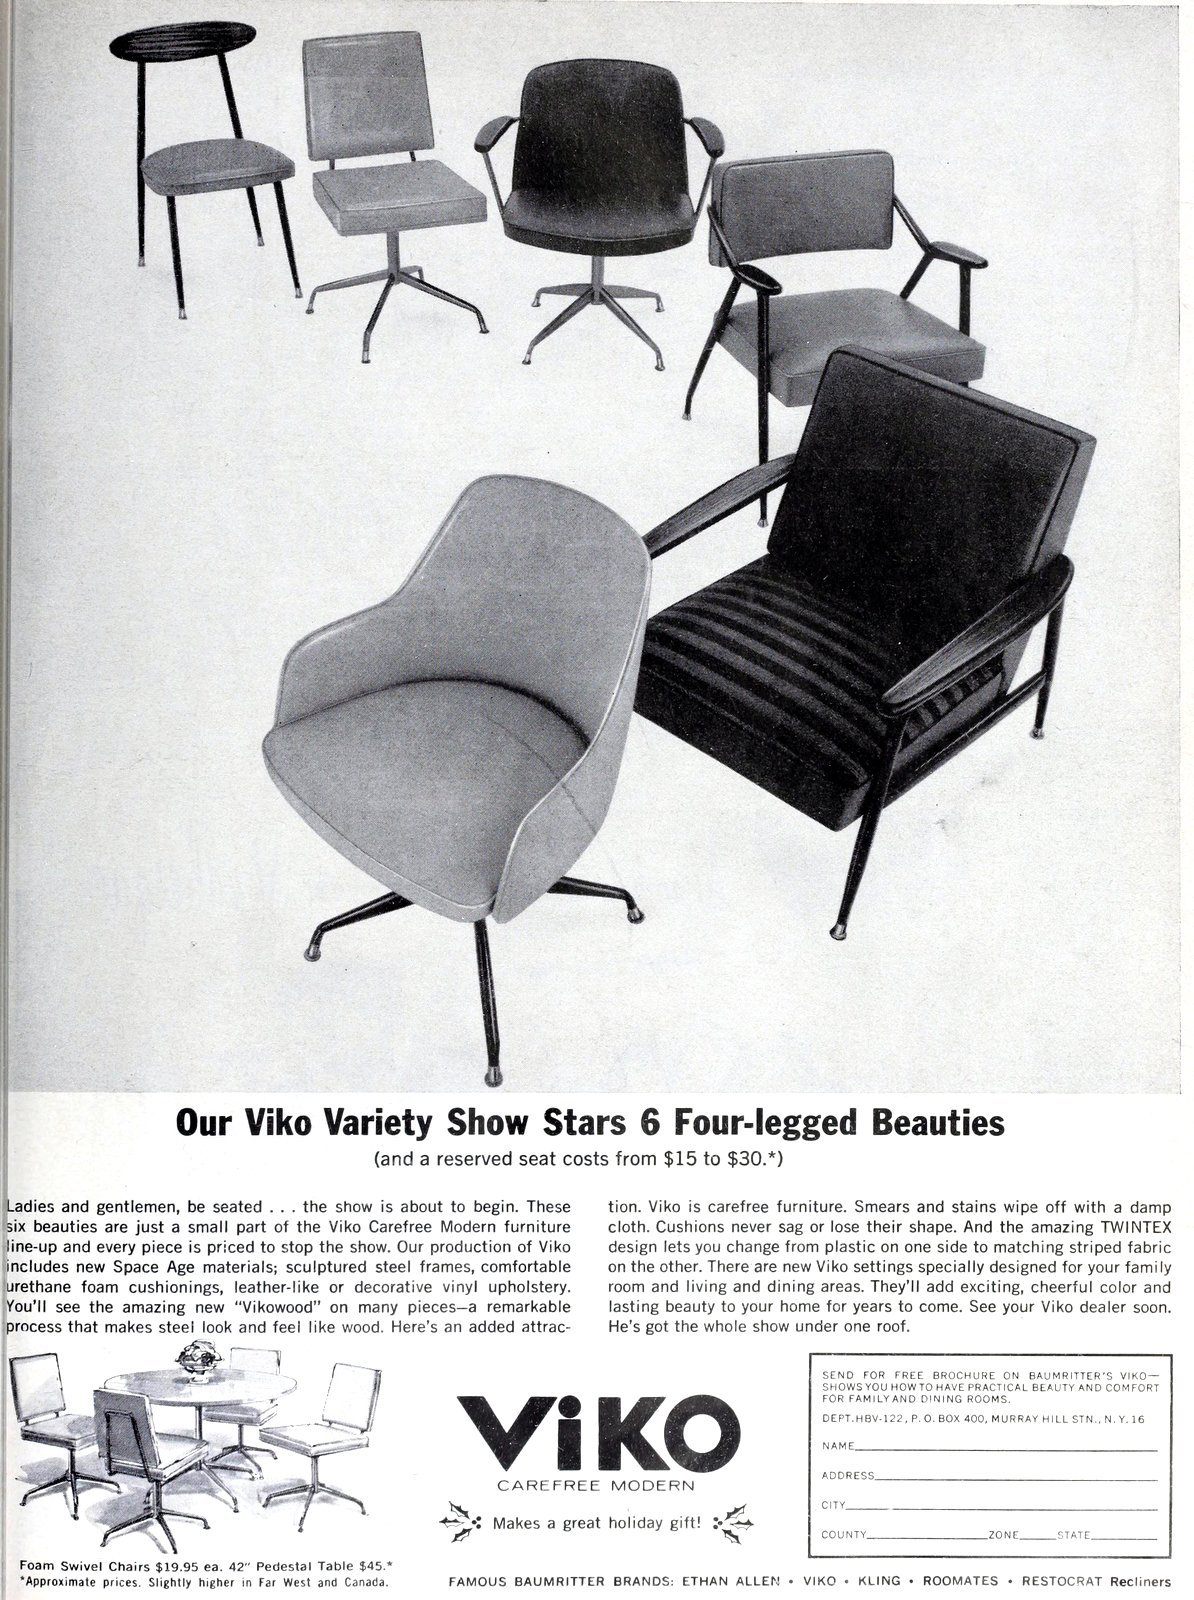 6 vintage Viko chair styles (1962)